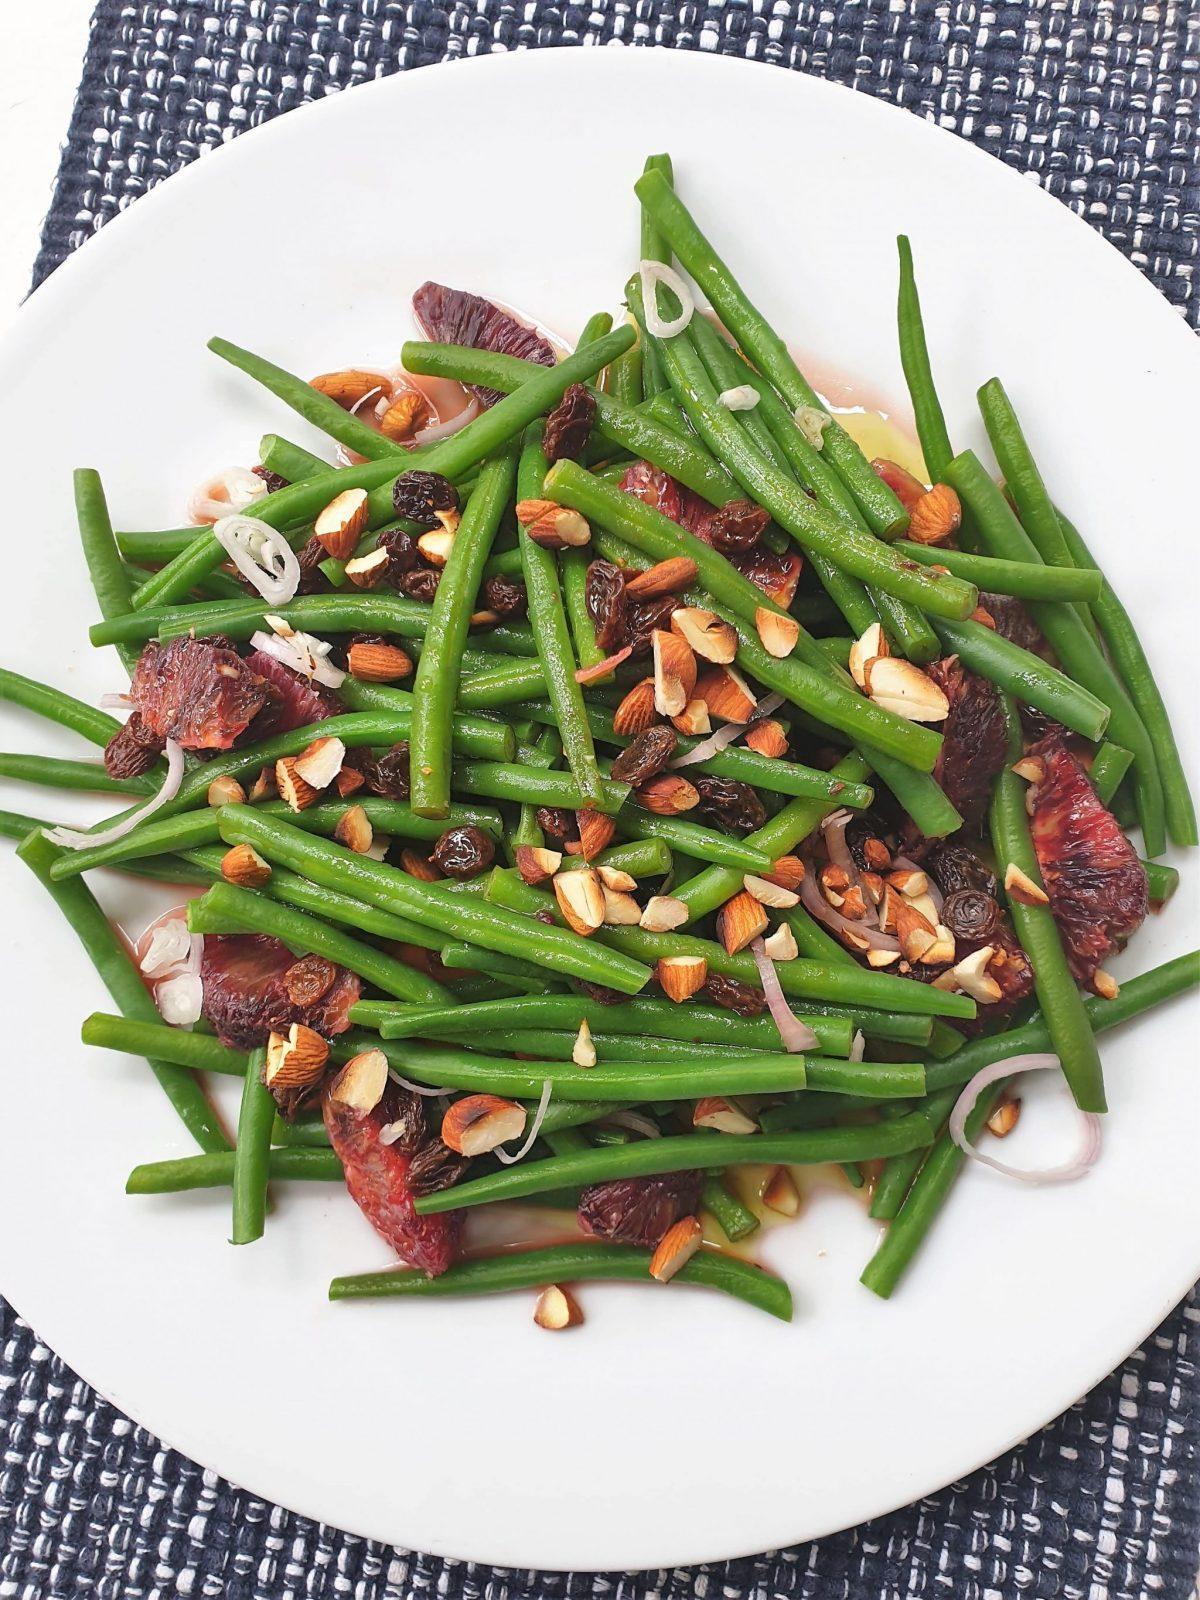 Sicilia green beans